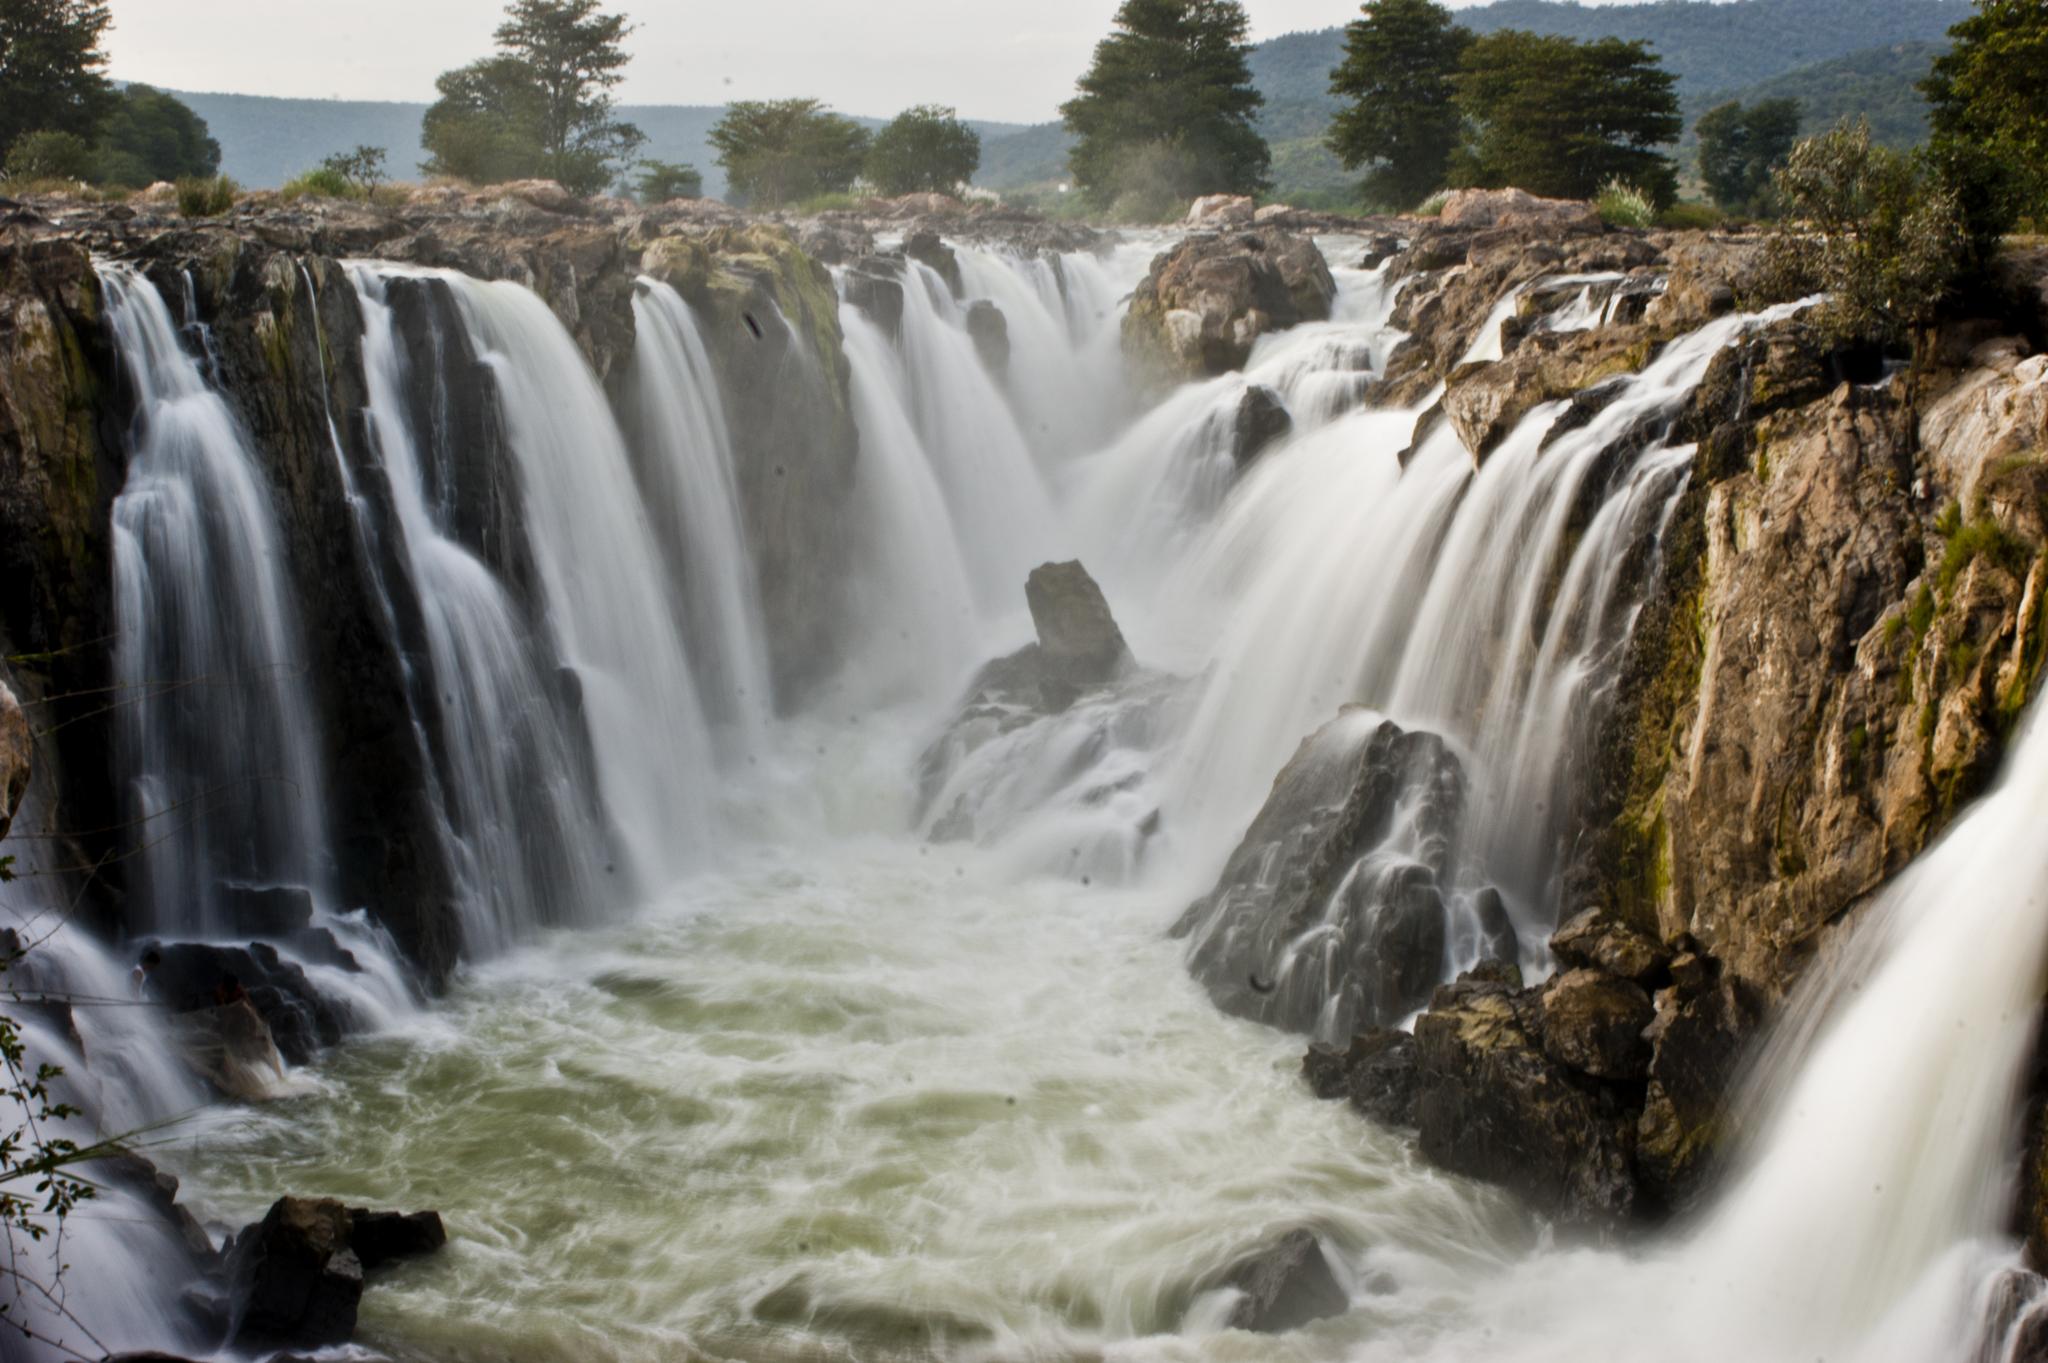 Photo Credit http://commons.wikimedia.org/wiki/File:Hogenakkal_Falls_Tamil_Nadu.jpg